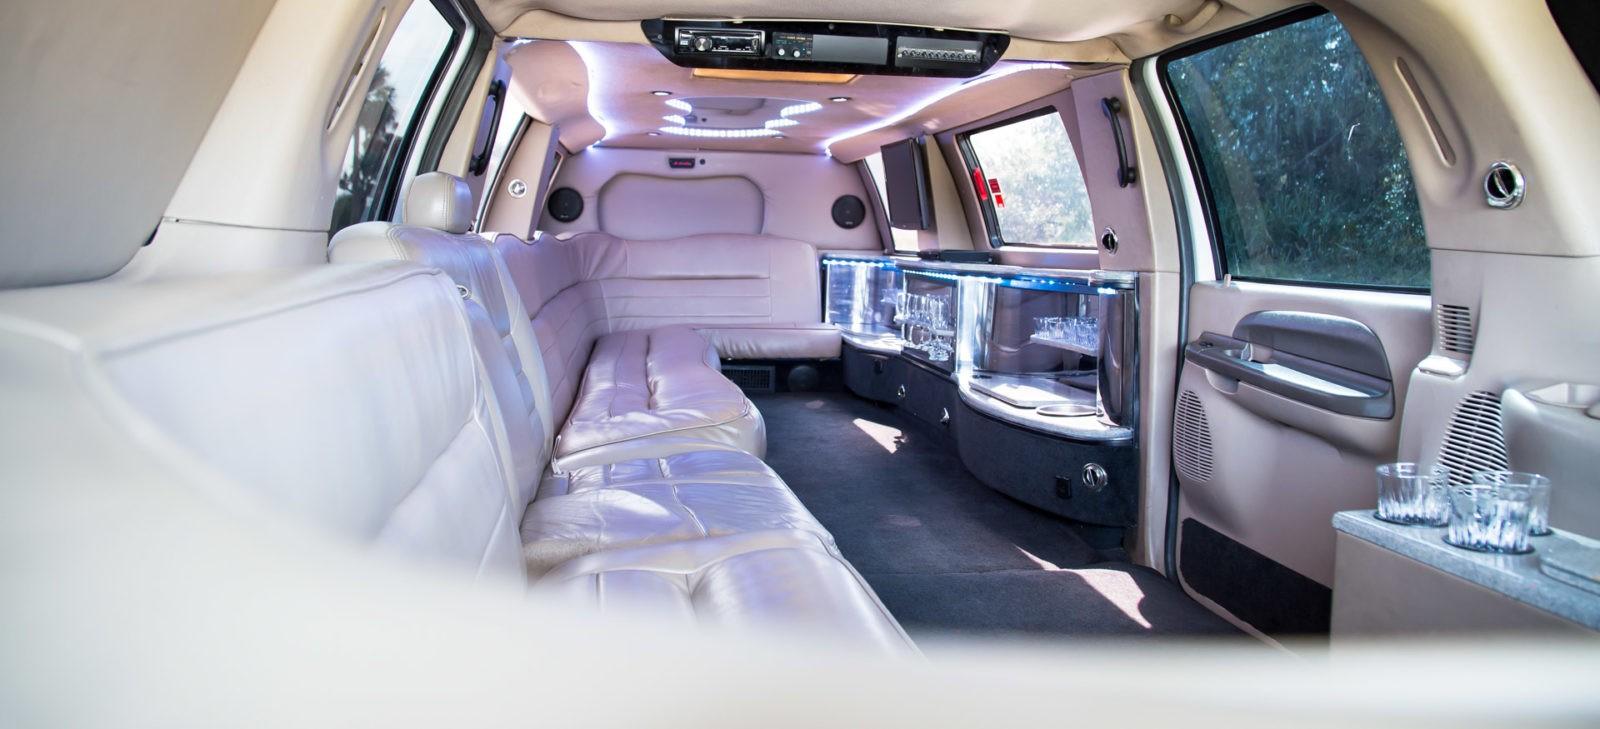 14 Passenger Limousine Apollo S Chariots